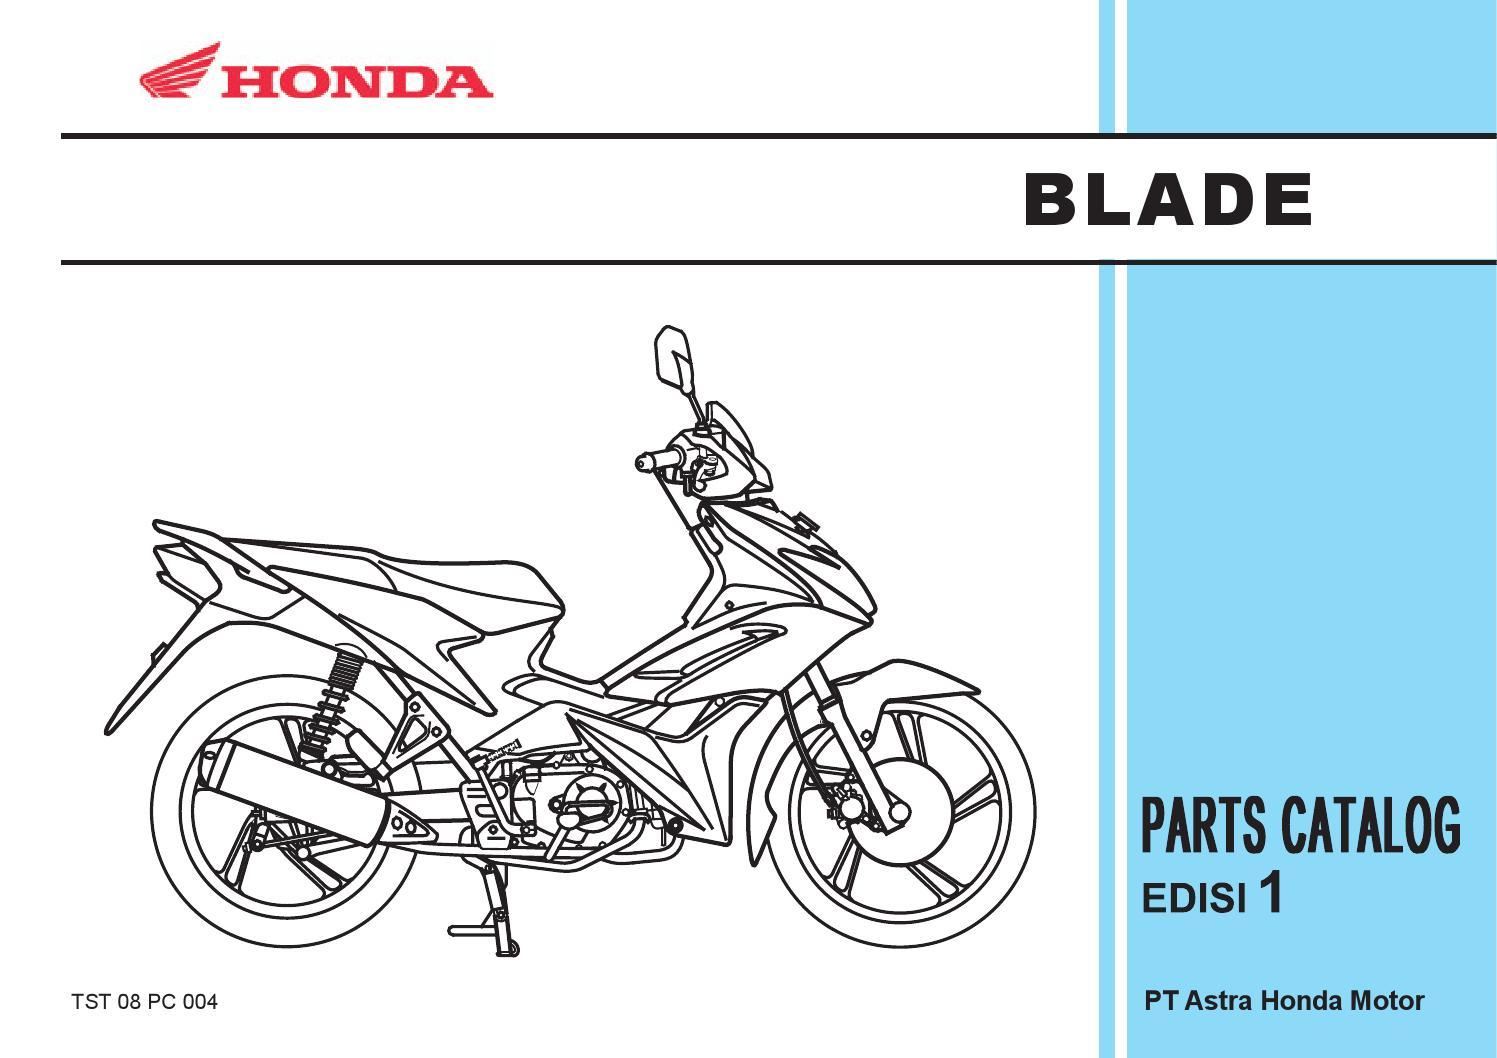 Part Catalog Honda Blade By Ahass Tunasjaya Issuu Oring Sil Seal 110